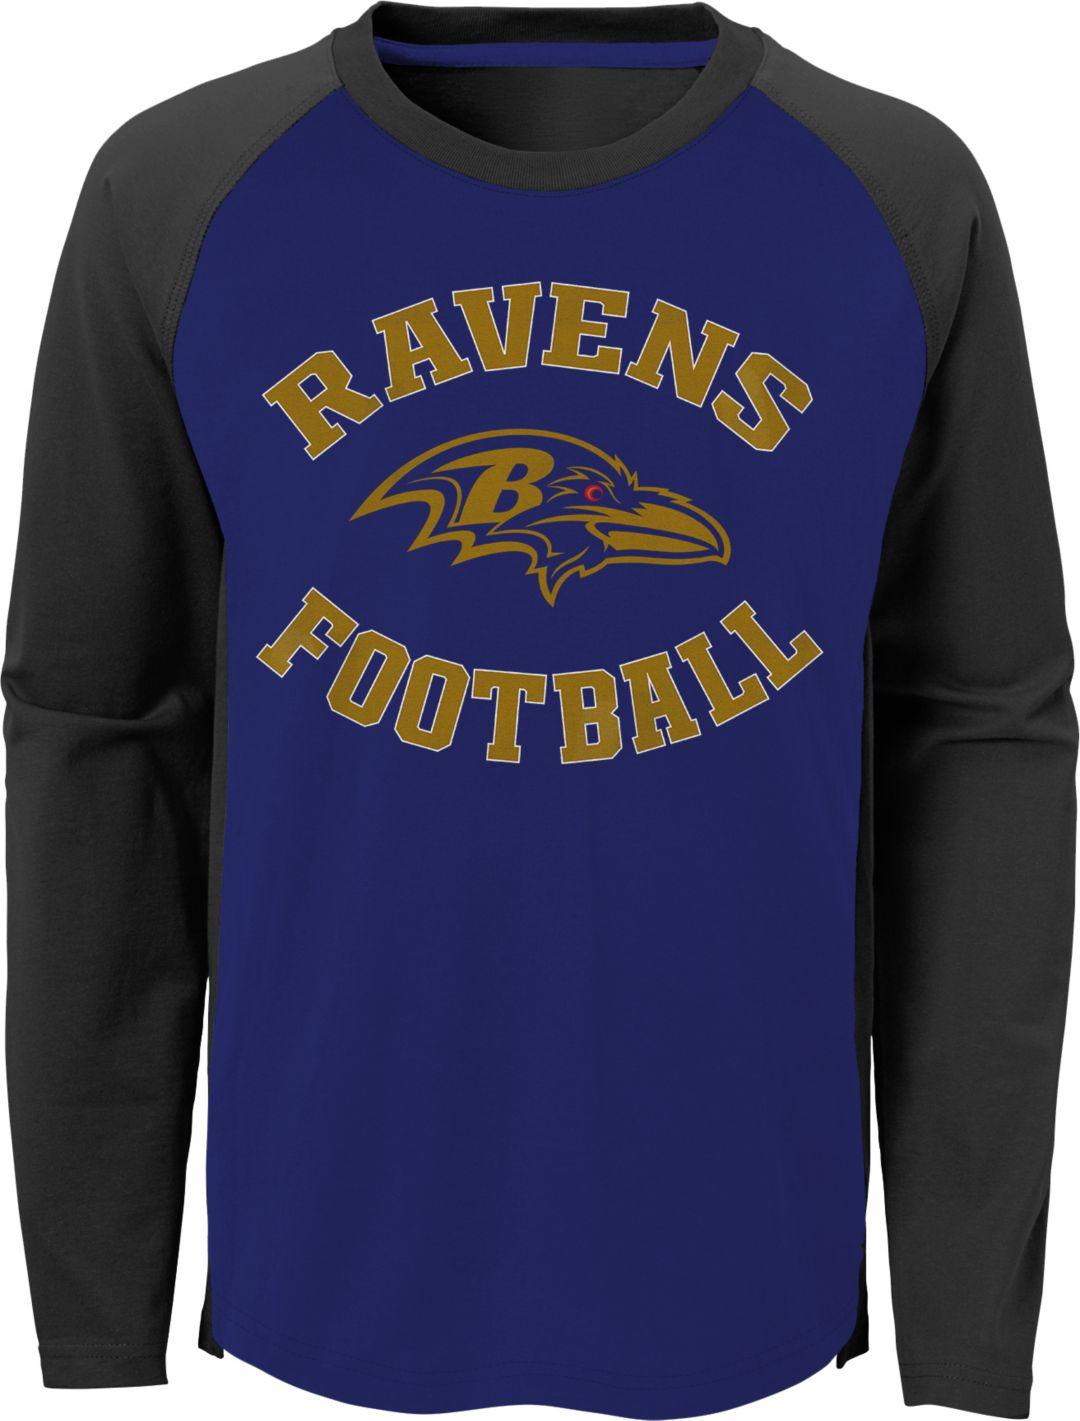 3bb3e879 NFL Team Apparel Youth Baltimore Ravens Air Raid Long Sleeve Purple Shirt